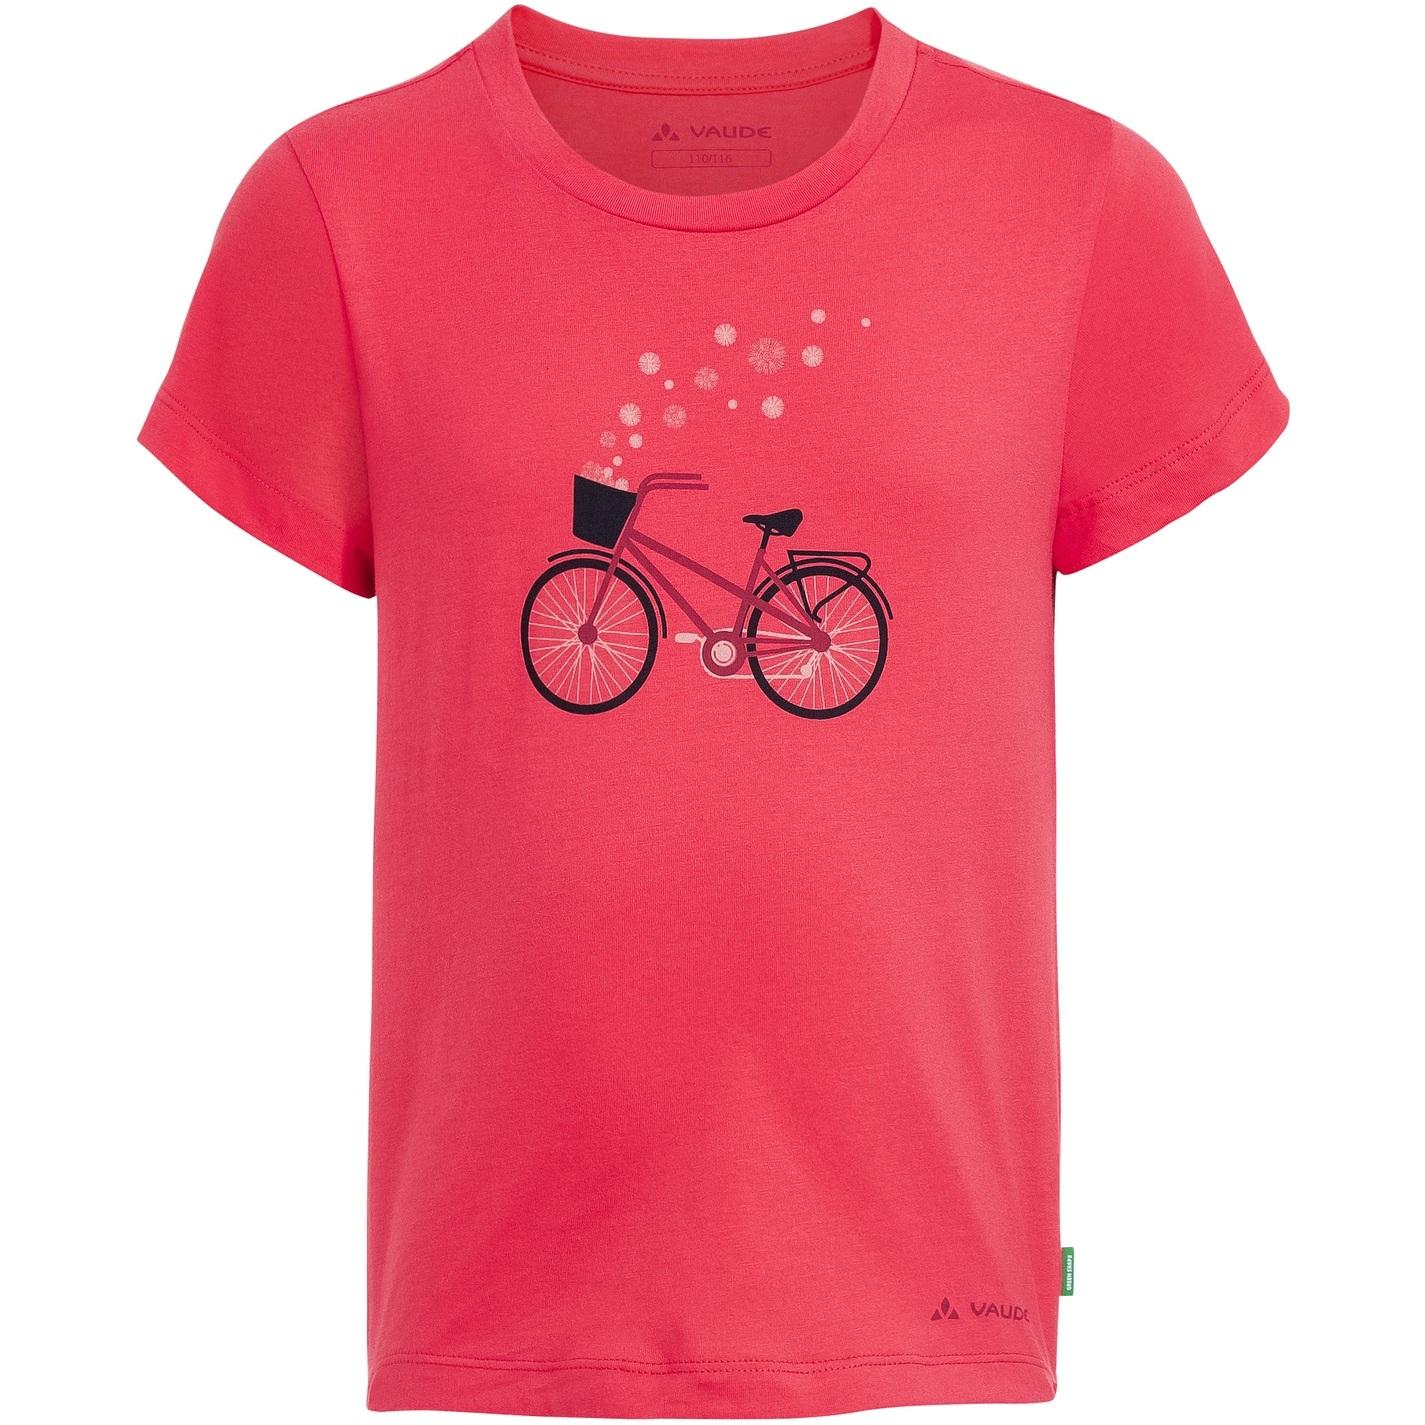 Vaude Kids Lezza T-Shirt - bright pink/cranberry